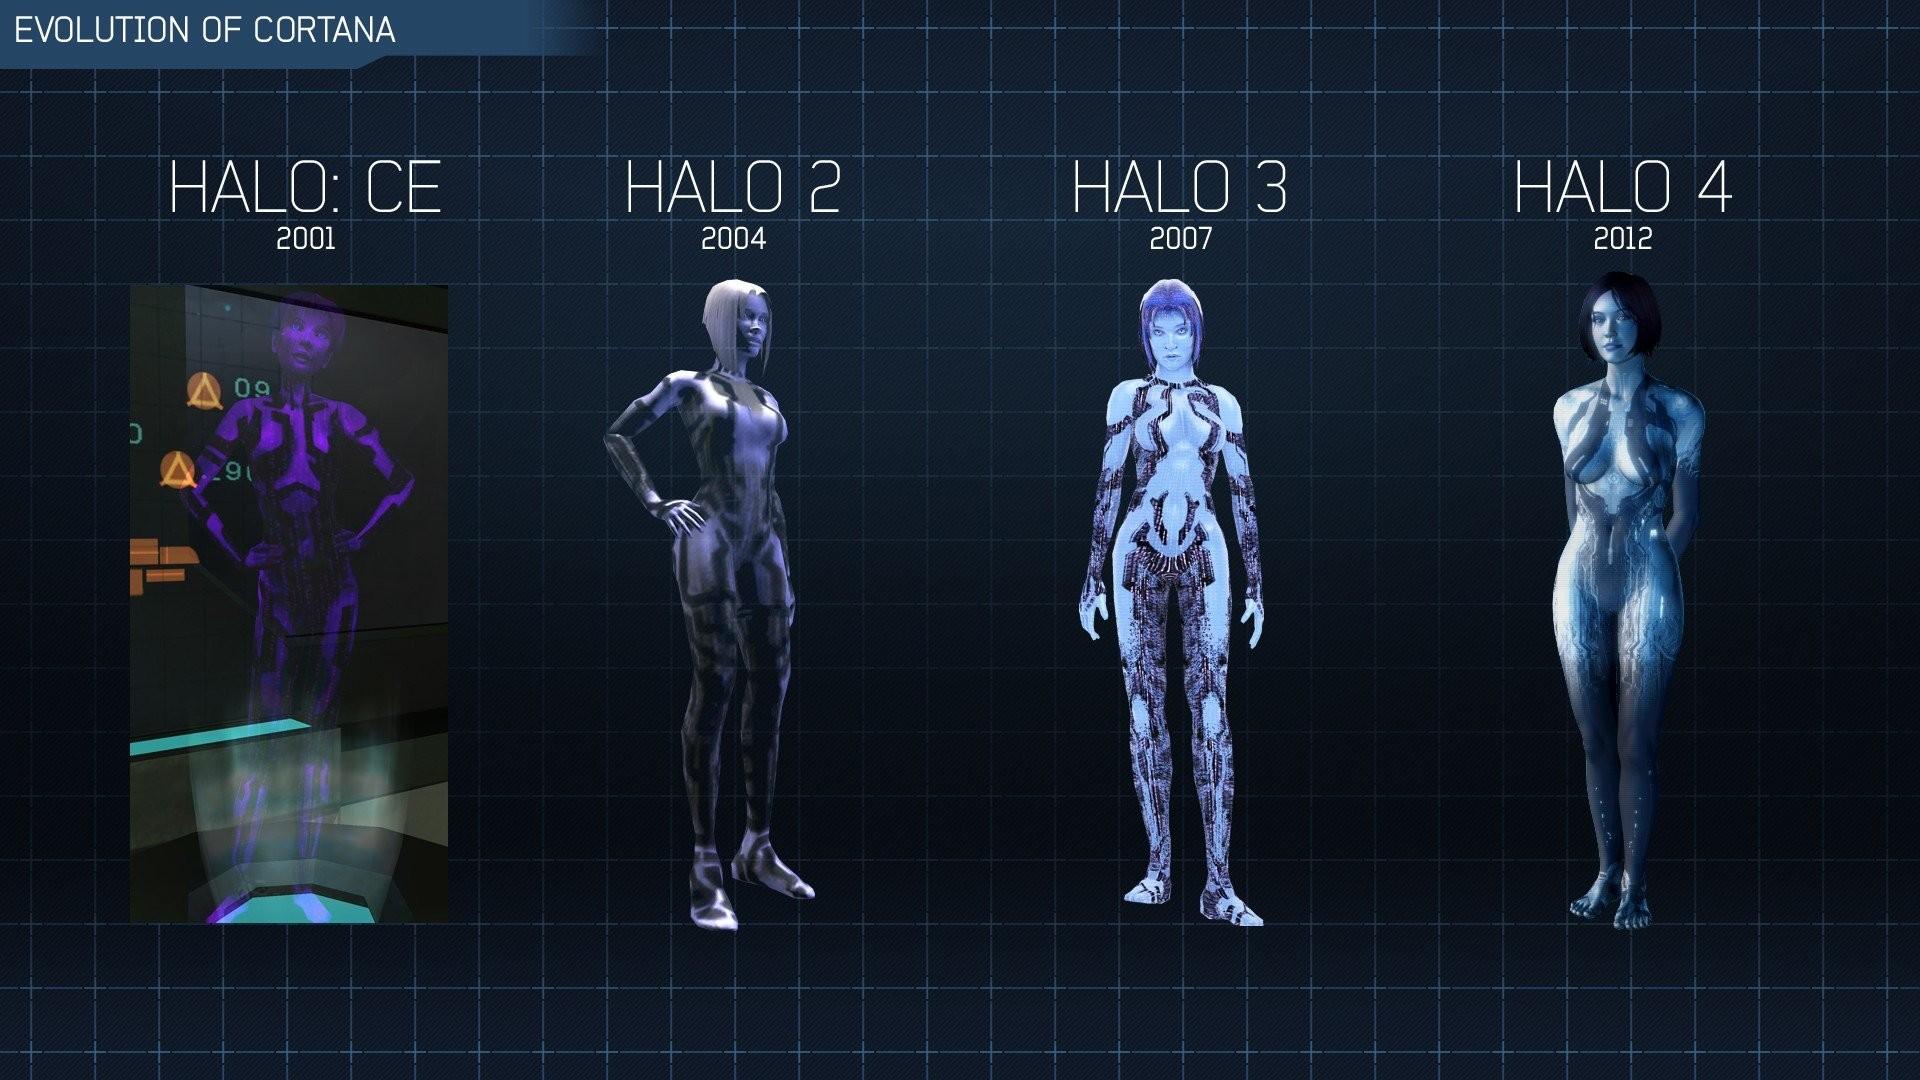 1920x1080 Video games Cortana Halo evolution Halo 4 Halo 2 wallpaper | 1920x1080 .